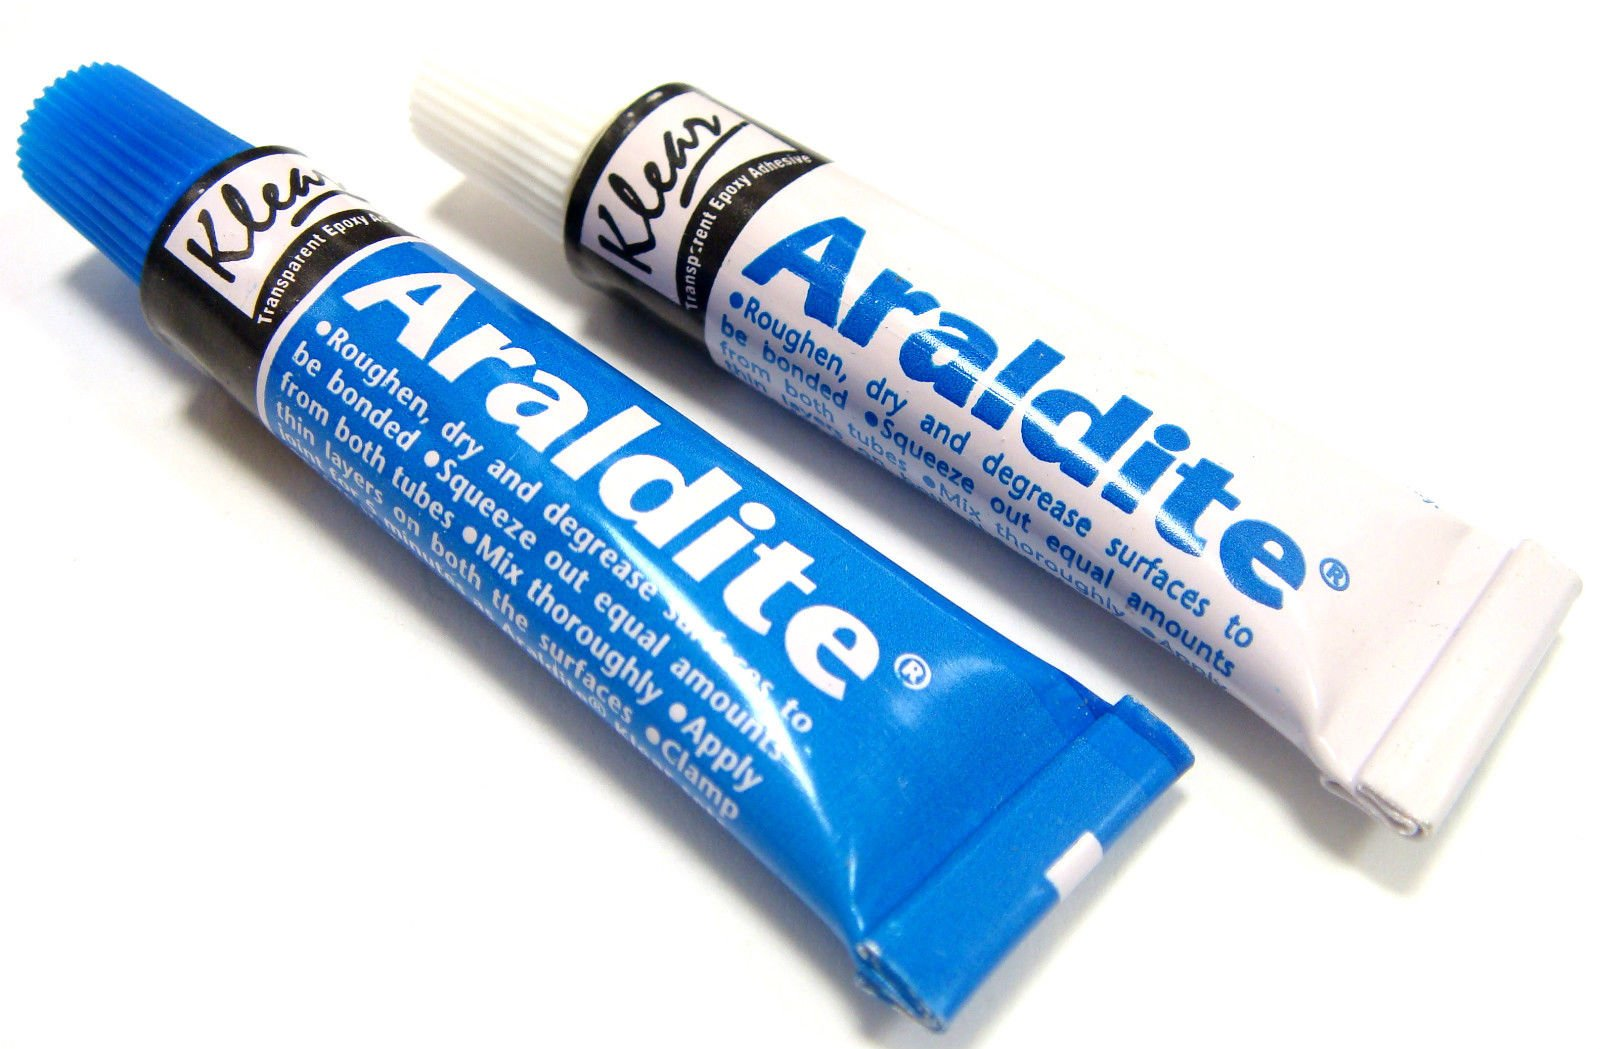 Araldite Epoxy Resin Glue 2 Part Clear Epoxy Adhesive Transparent Quick Dry Glue